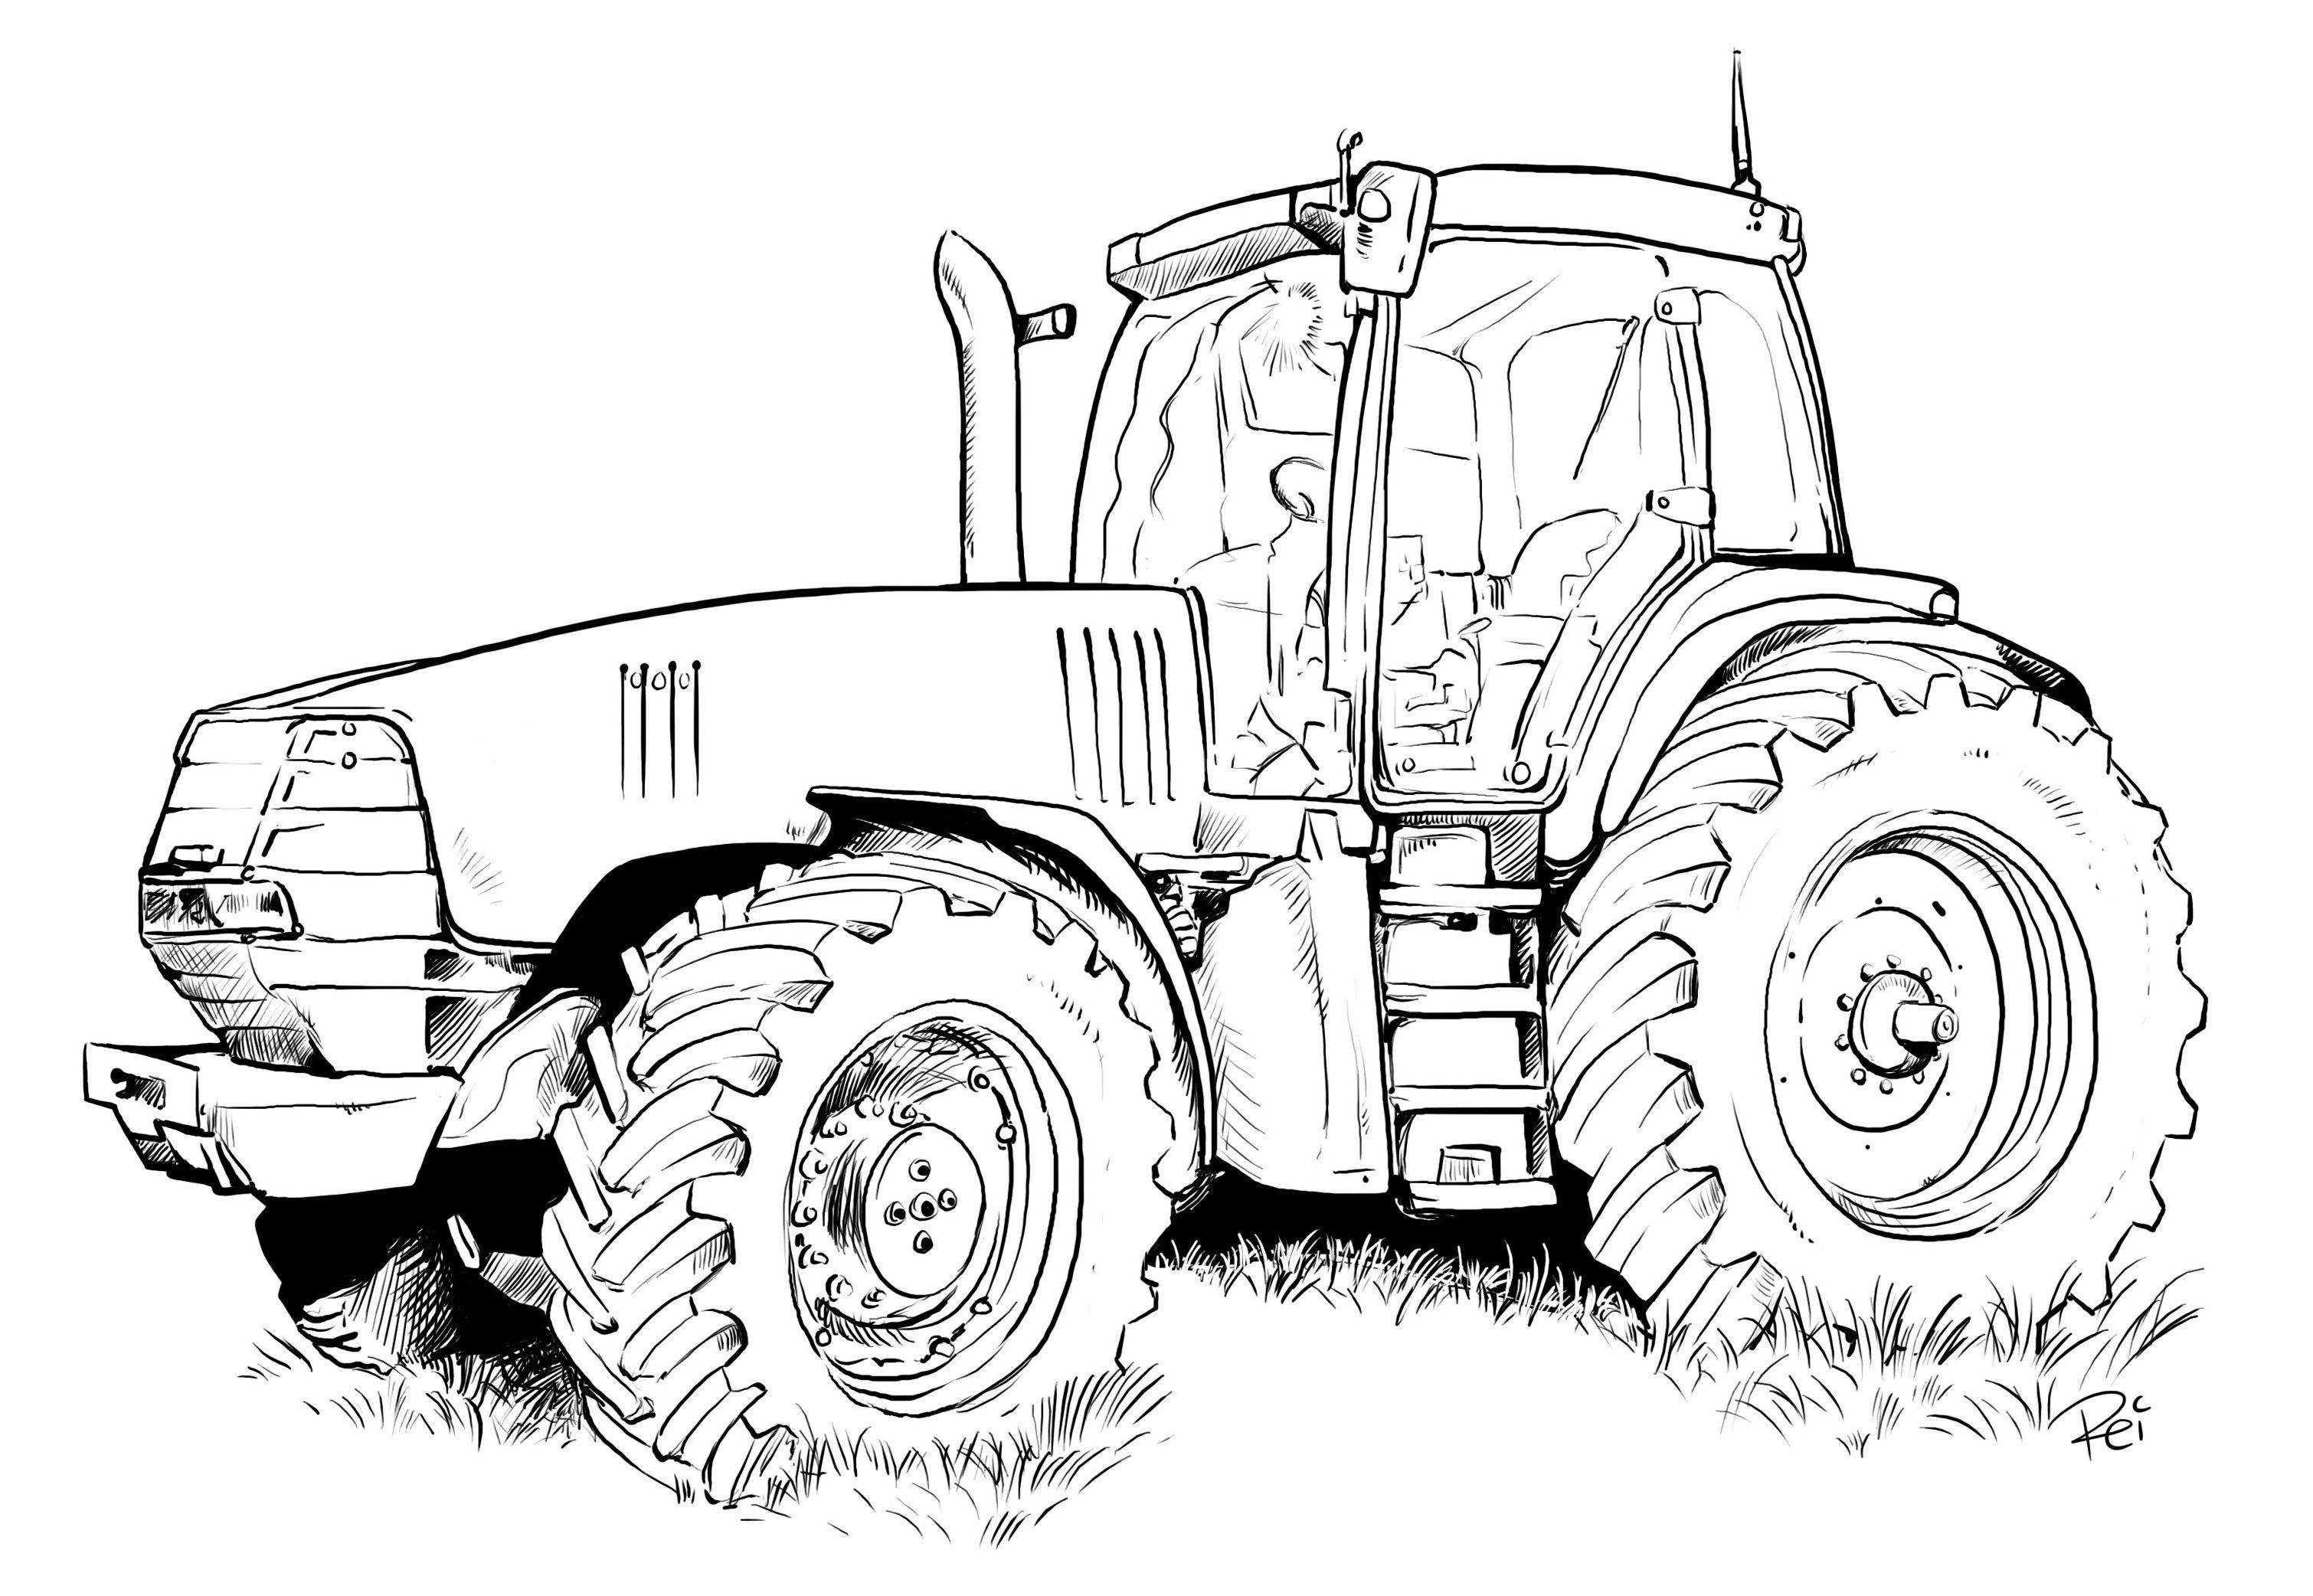 Einzigartig Malvorlage Traktor Malvorlagen Malvorlagenfurkinder Malvorlagenfurerwach Tractor Coloring Pages Coloring Pages Inspirational Deer Coloring Pages [ 2084 x 3020 Pixel ]